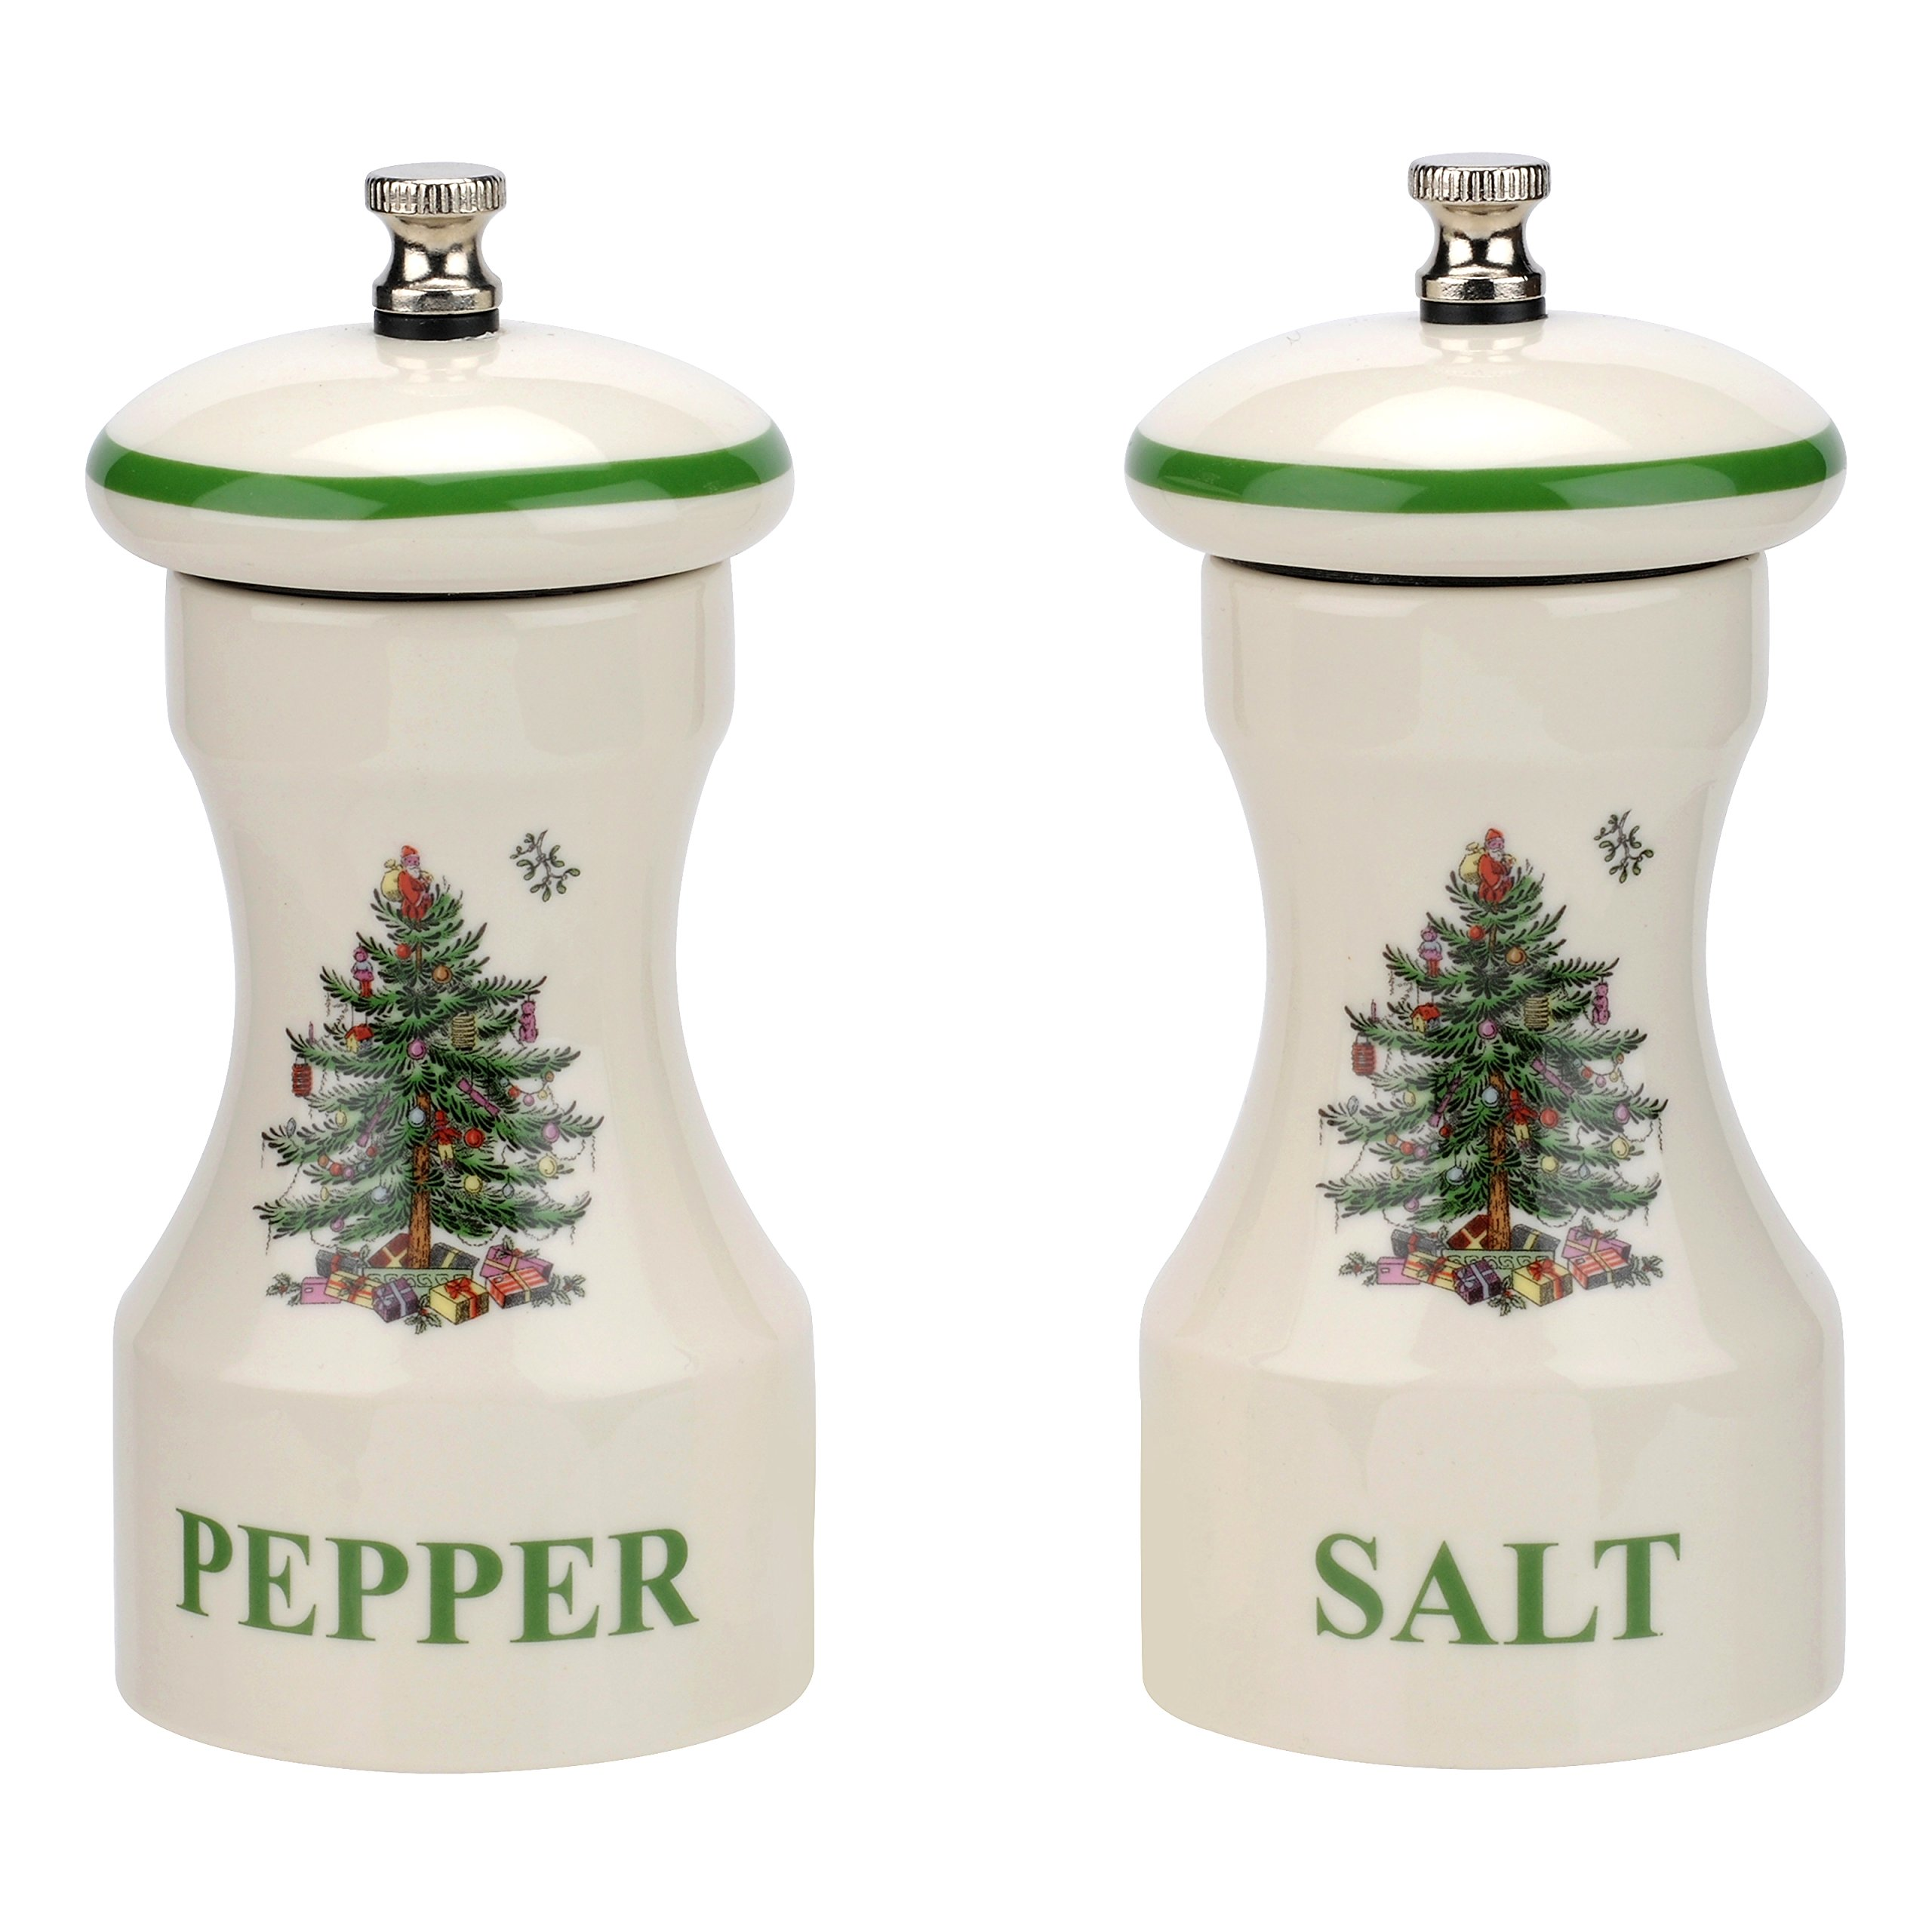 Cheap Christmas Salt, find Christmas Salt deals on line at Alibaba.com